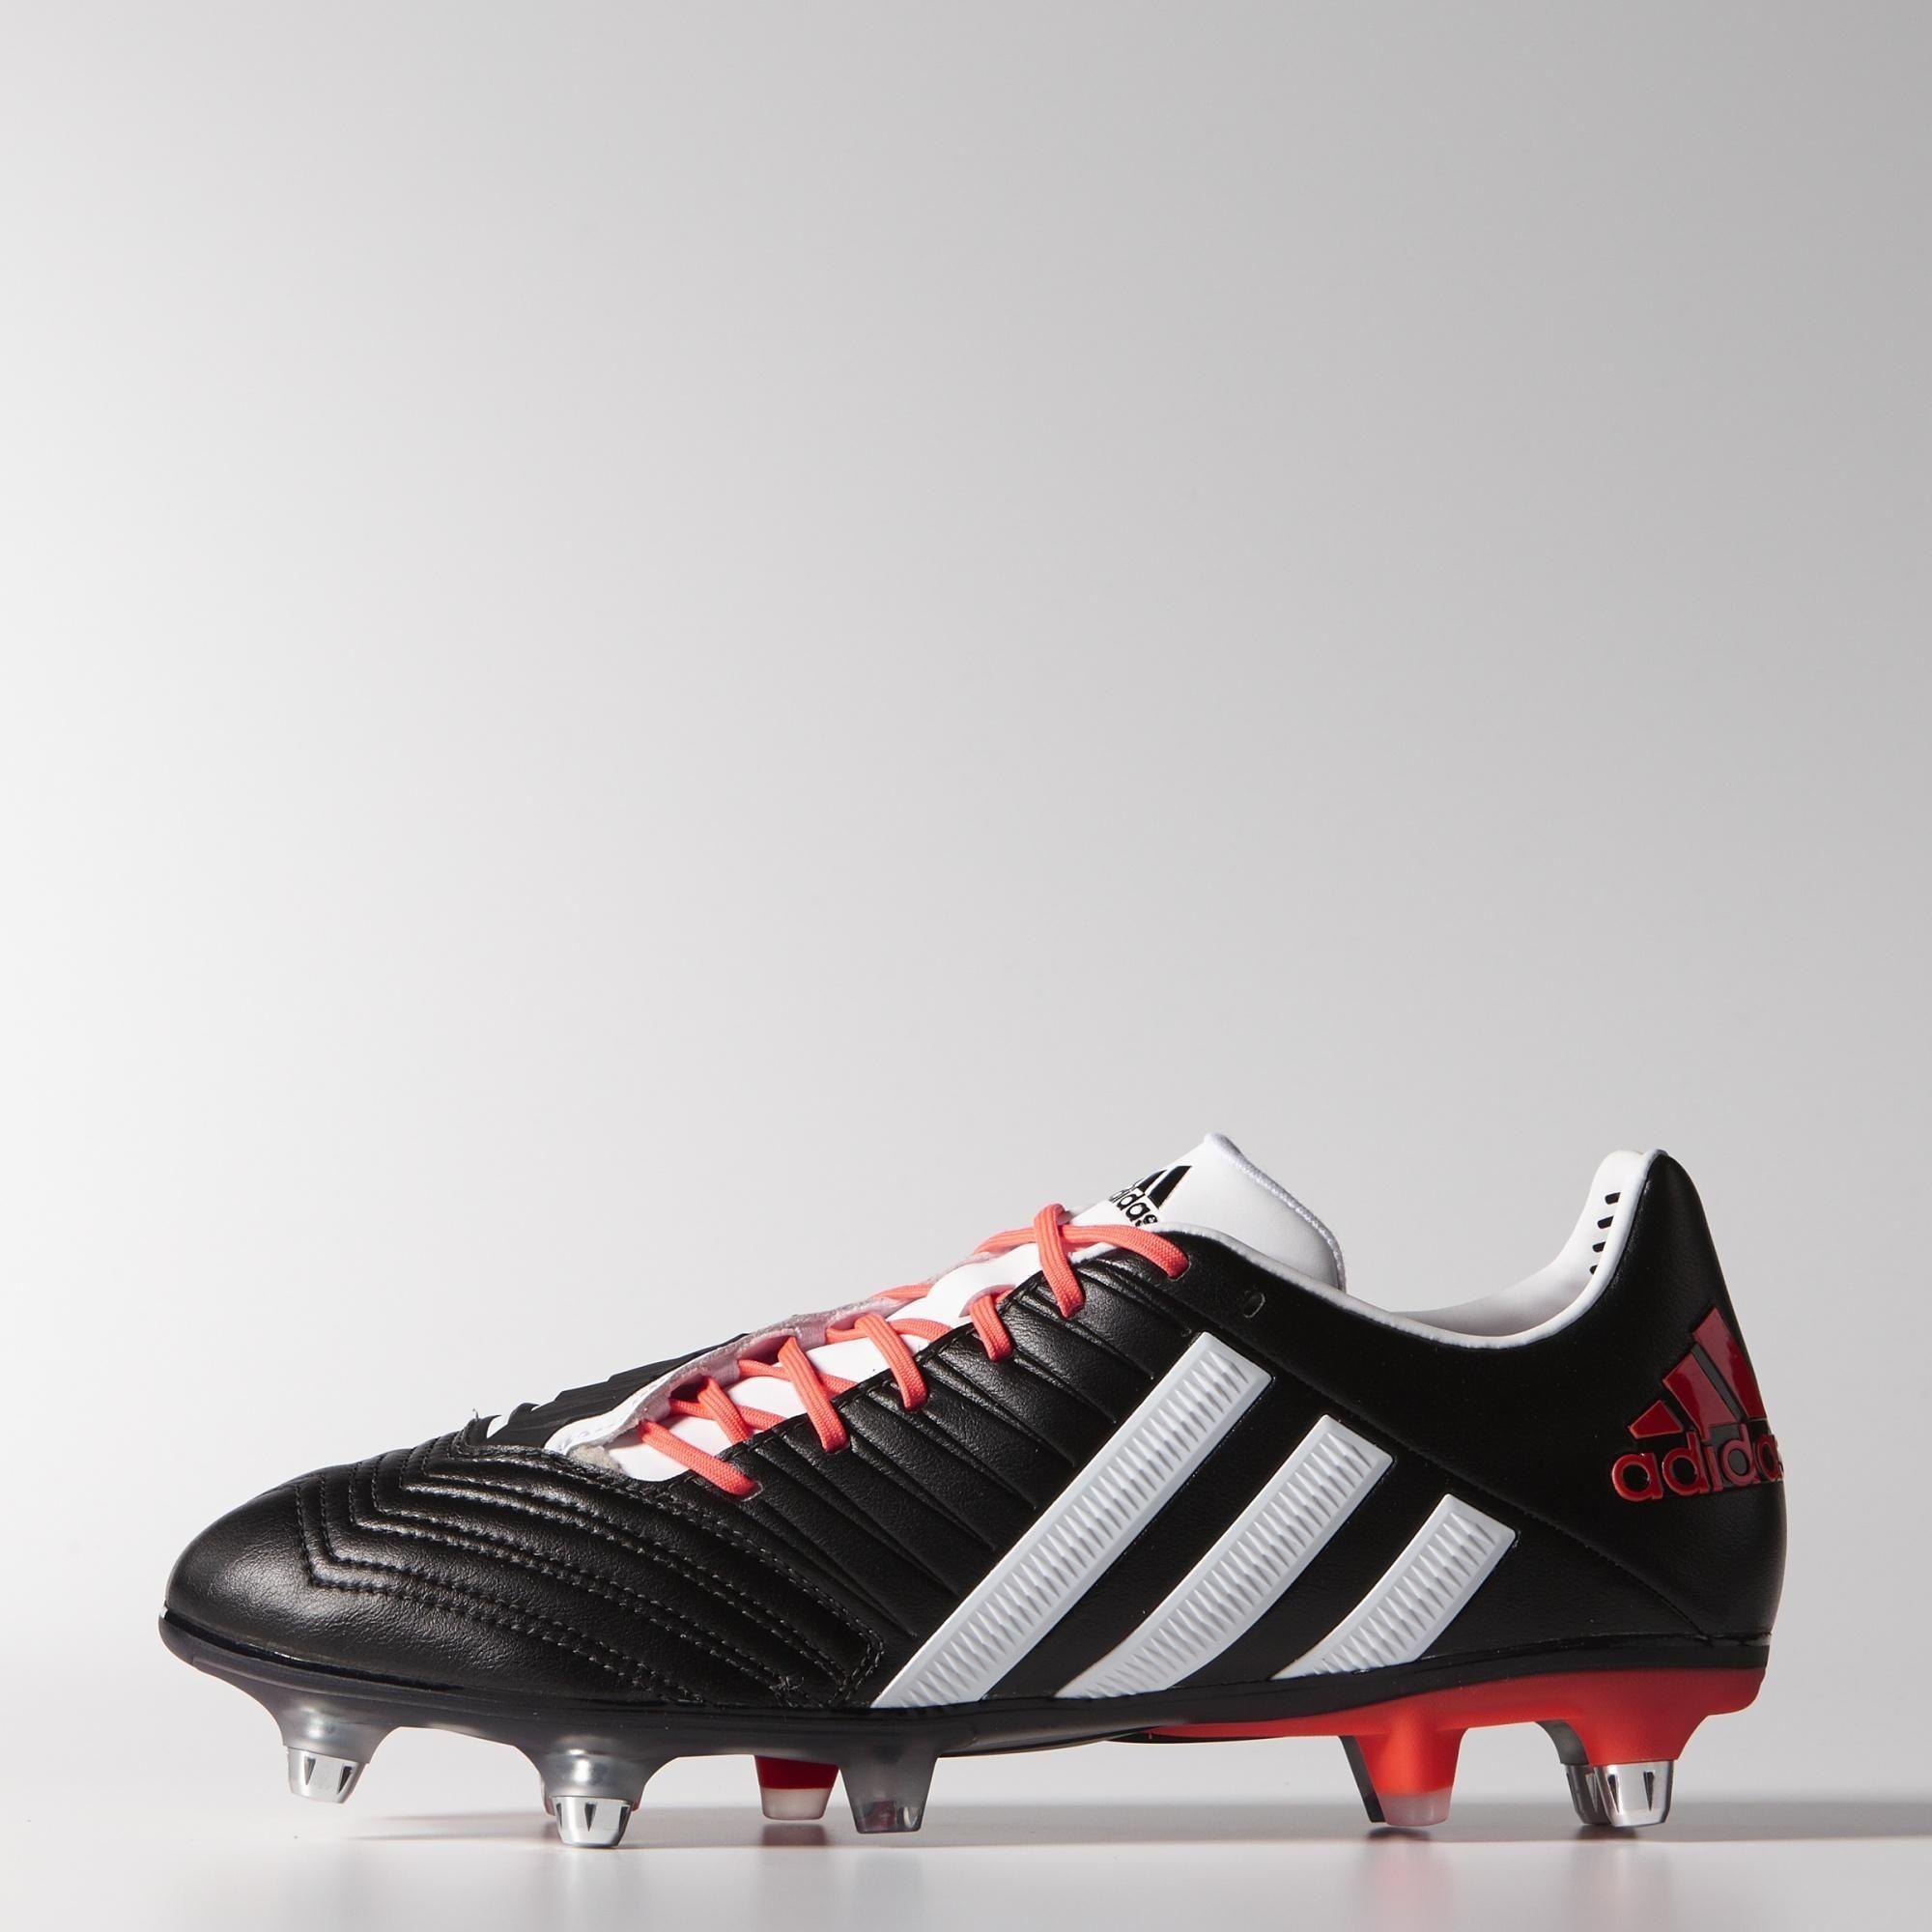 adidas Predator Incurza X-TRX SG Boots - Black | adidas New Zealand